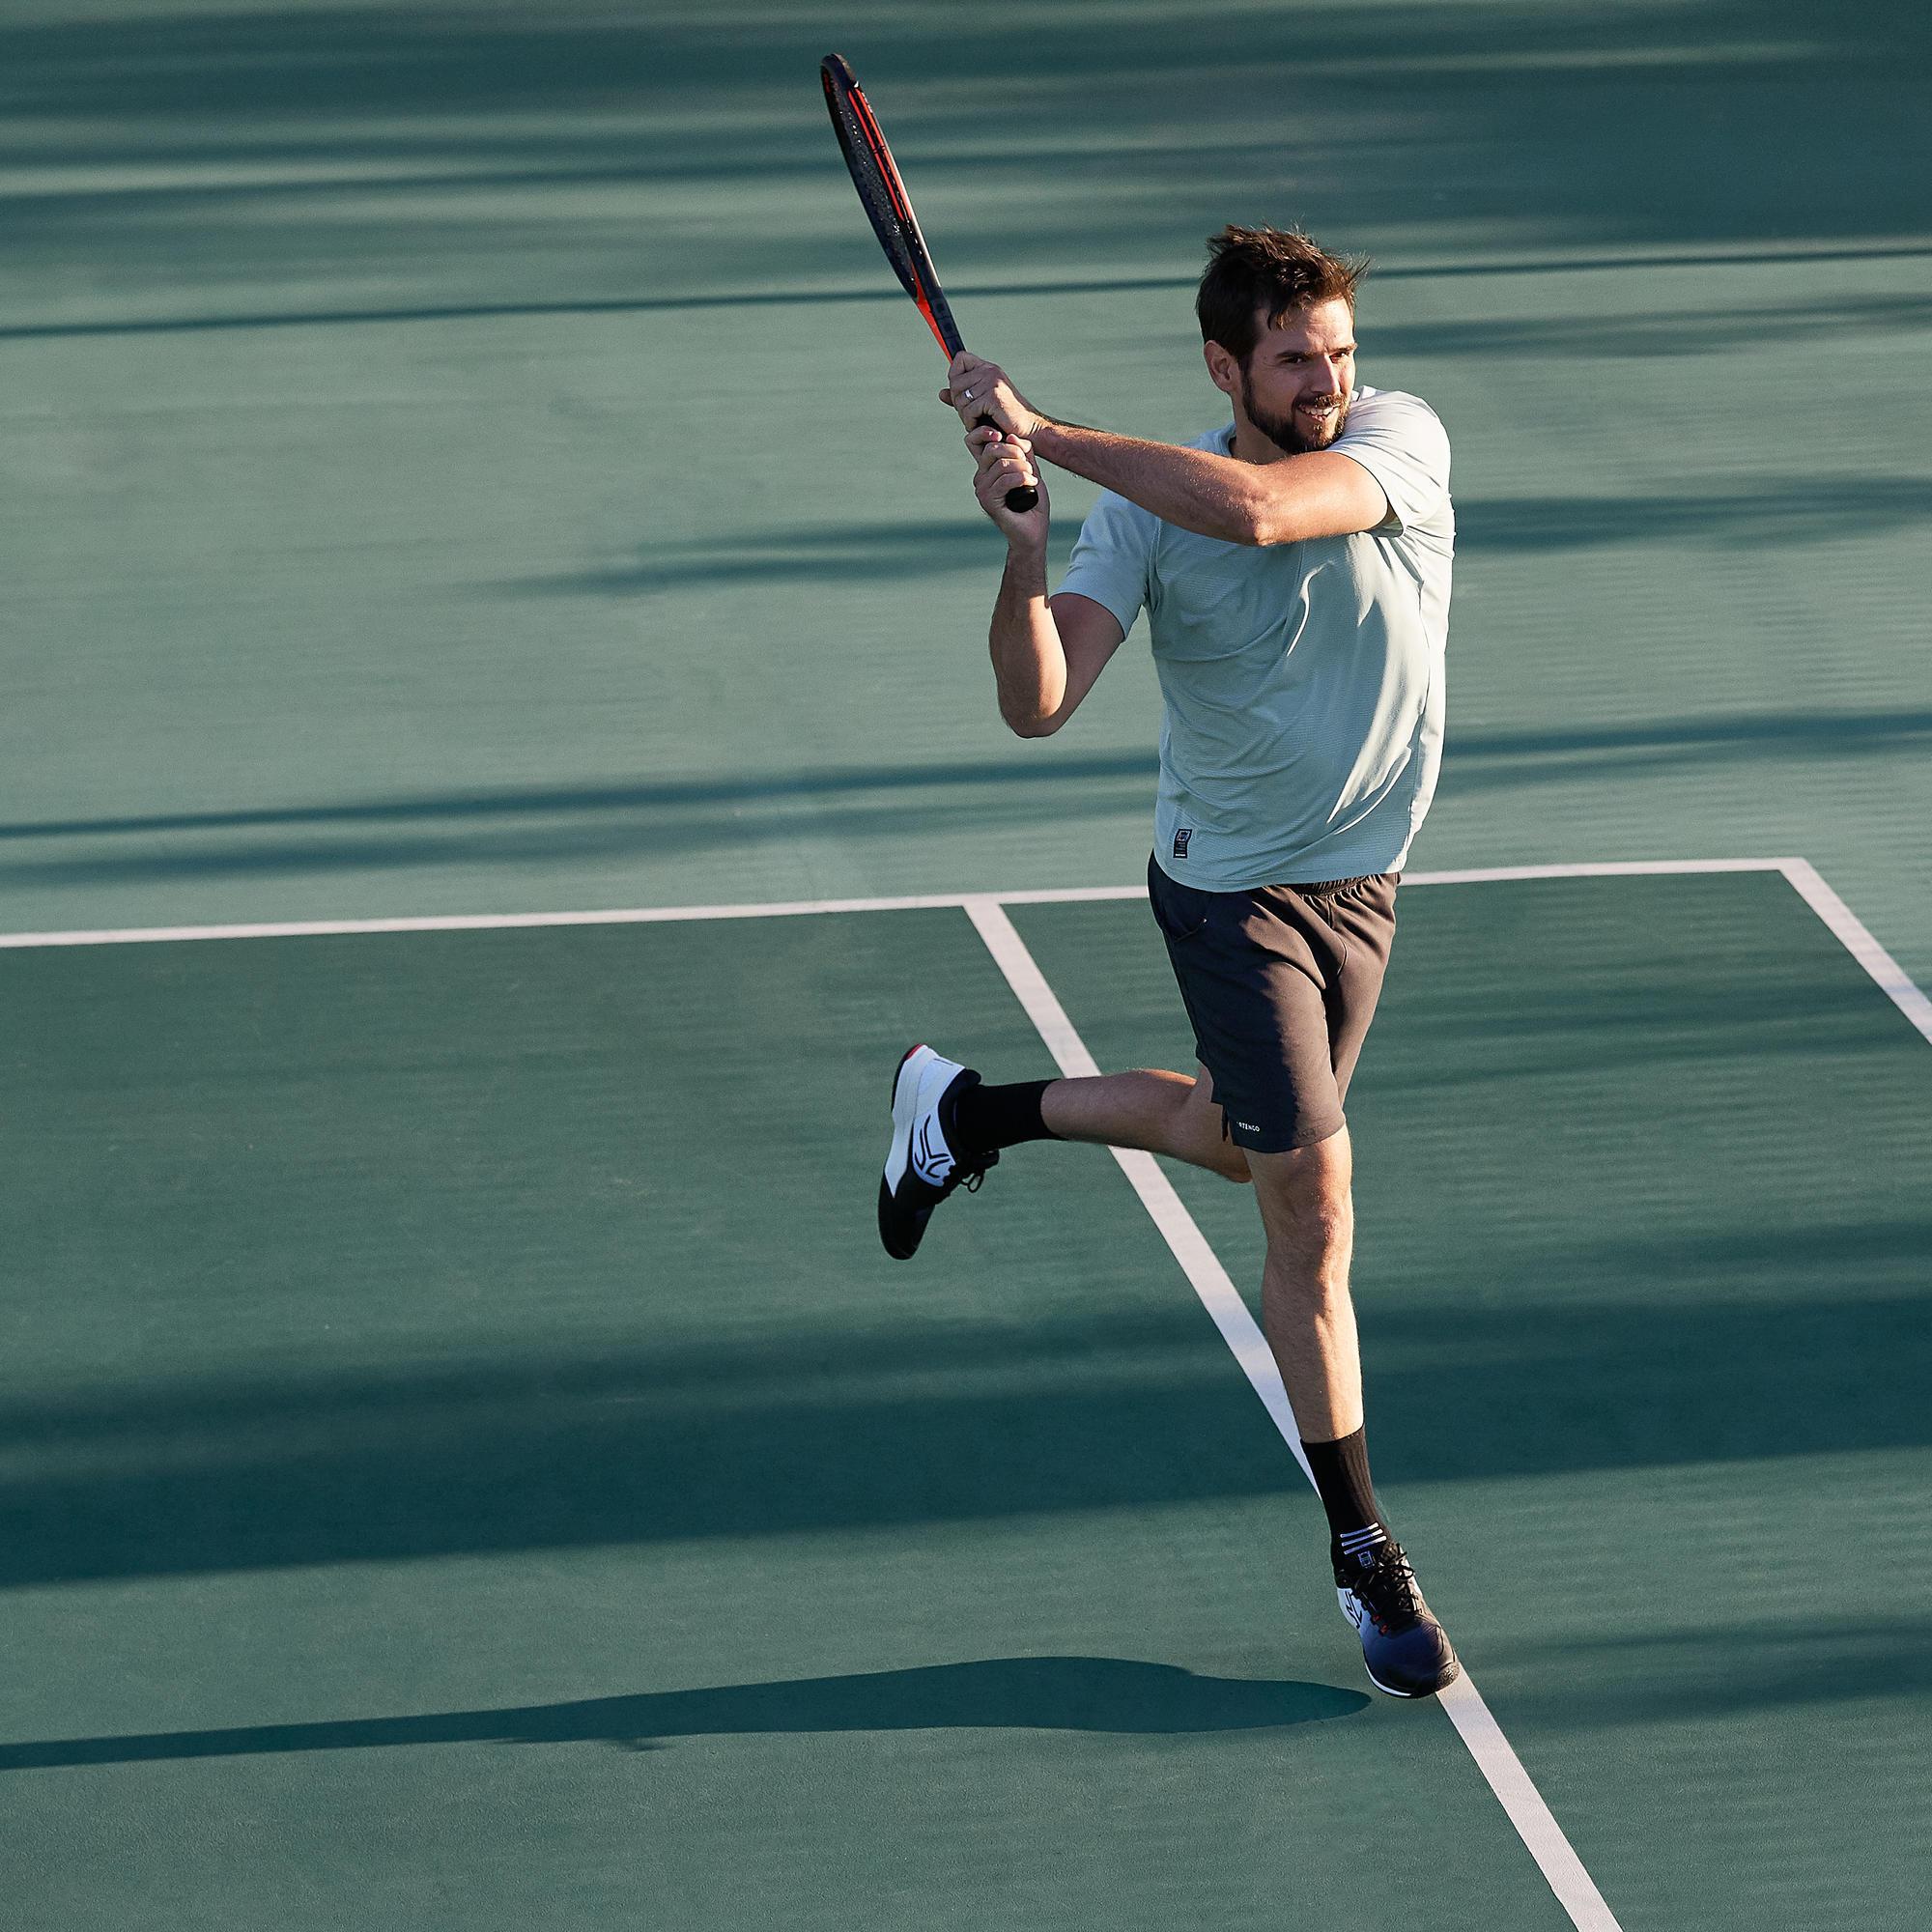 TS590 Multi-Court Tennis Shoes - Decathlon